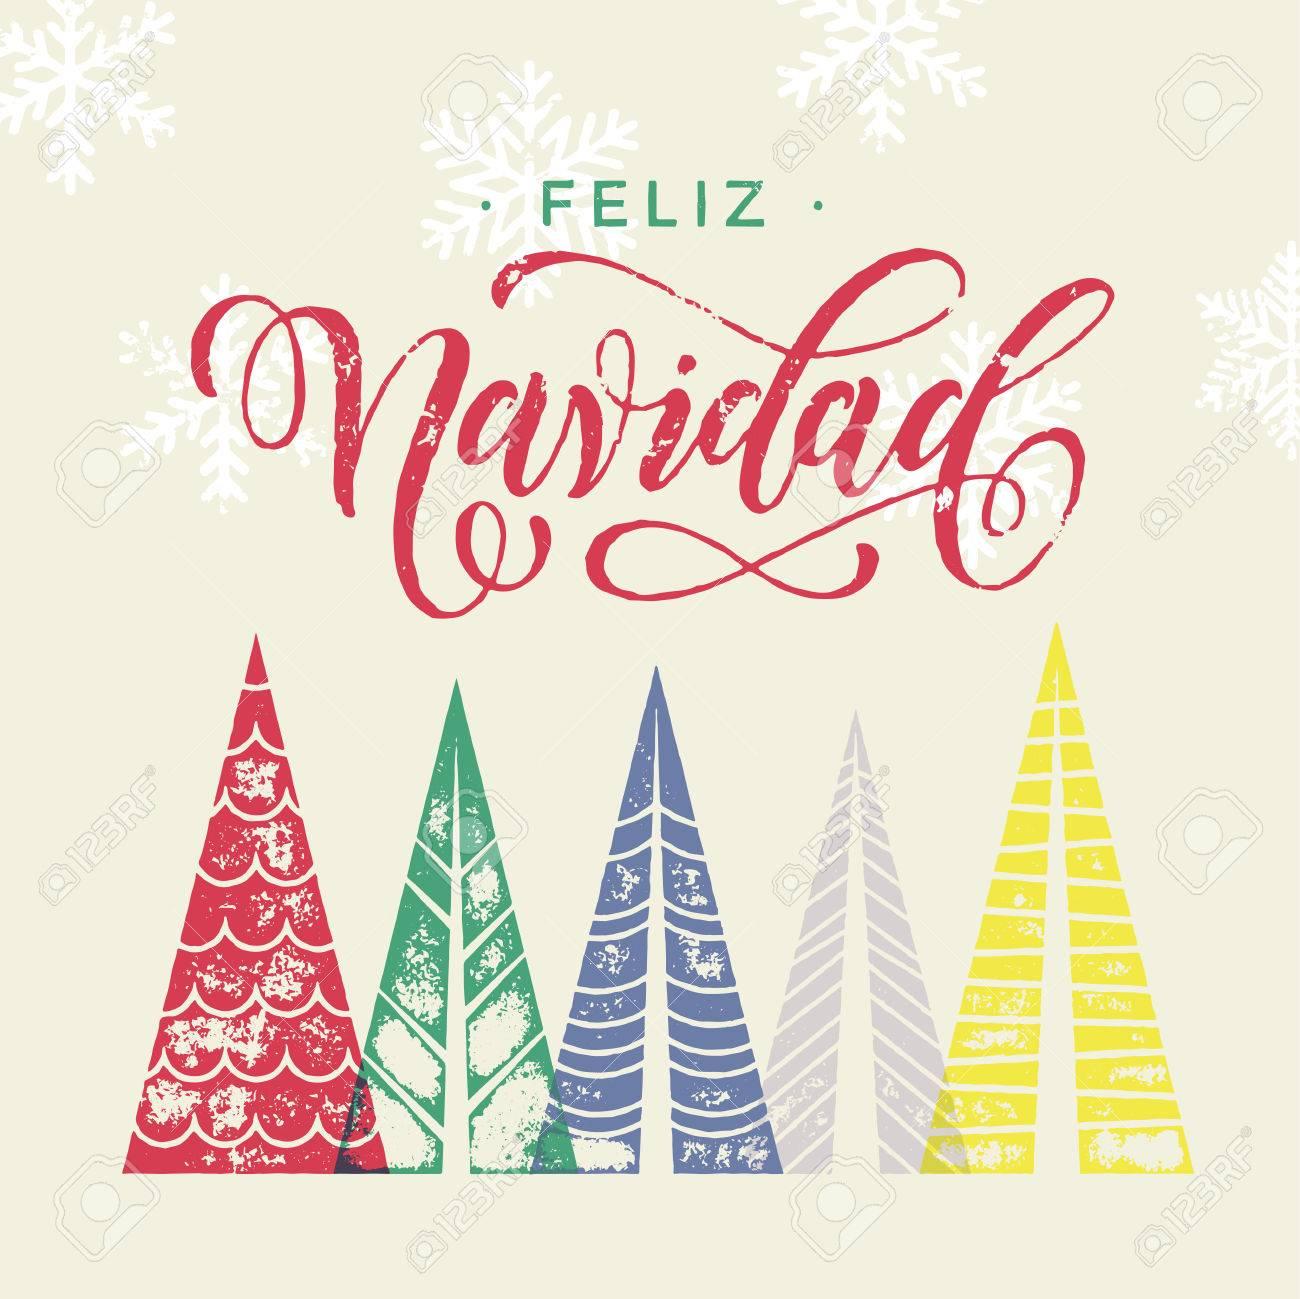 Colorful Winter Holiday Spanish Greeting Card Feliz Navidad